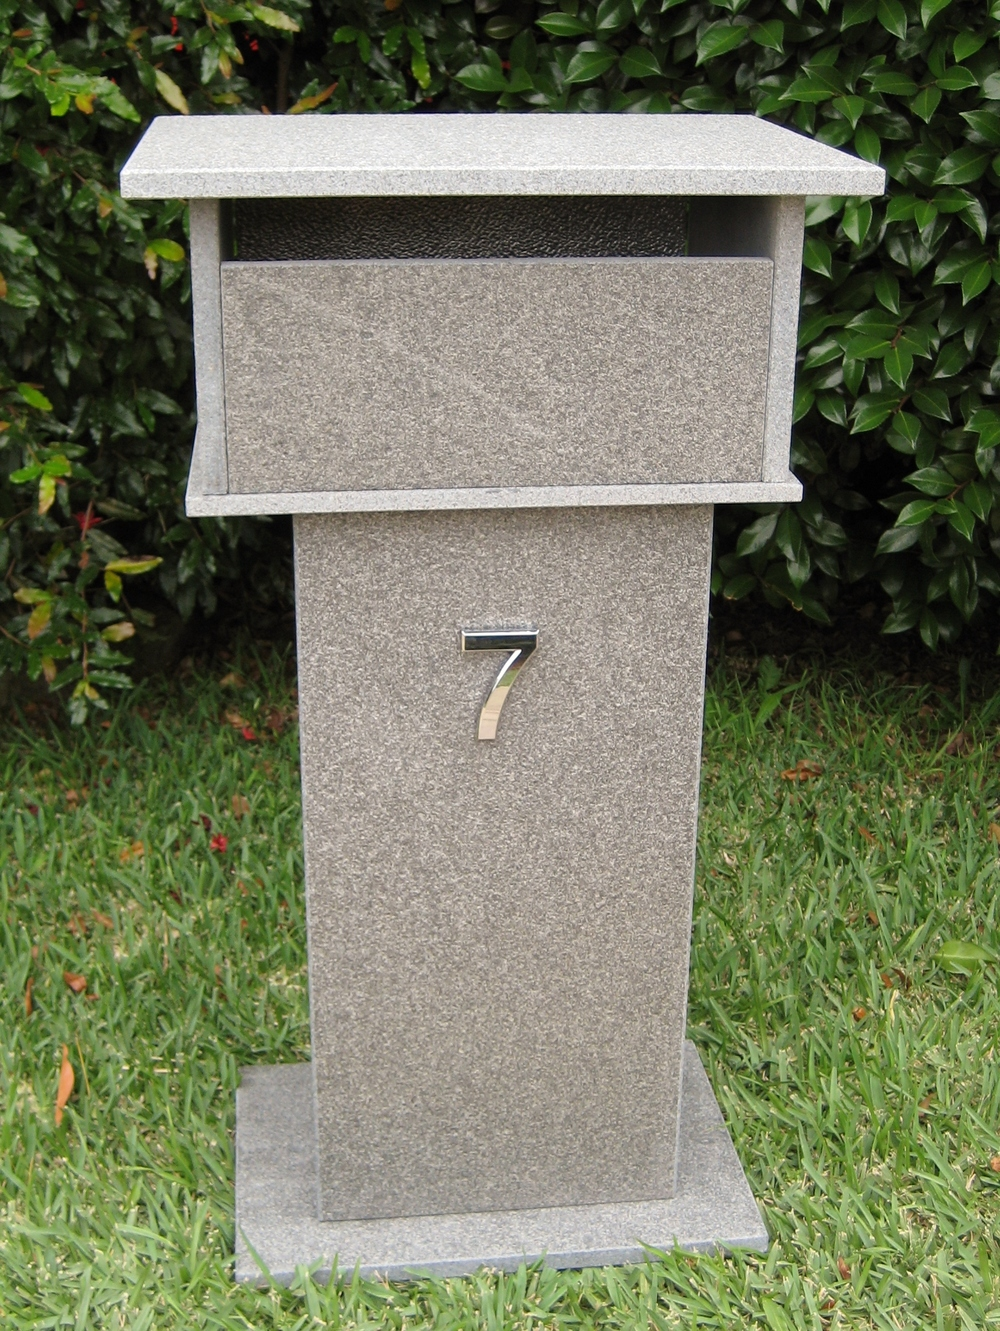 86. Blue stone letterbox with bushhammered finish. Back 2 key aluminium door. Tough material. Sizes 720x400x300 $431